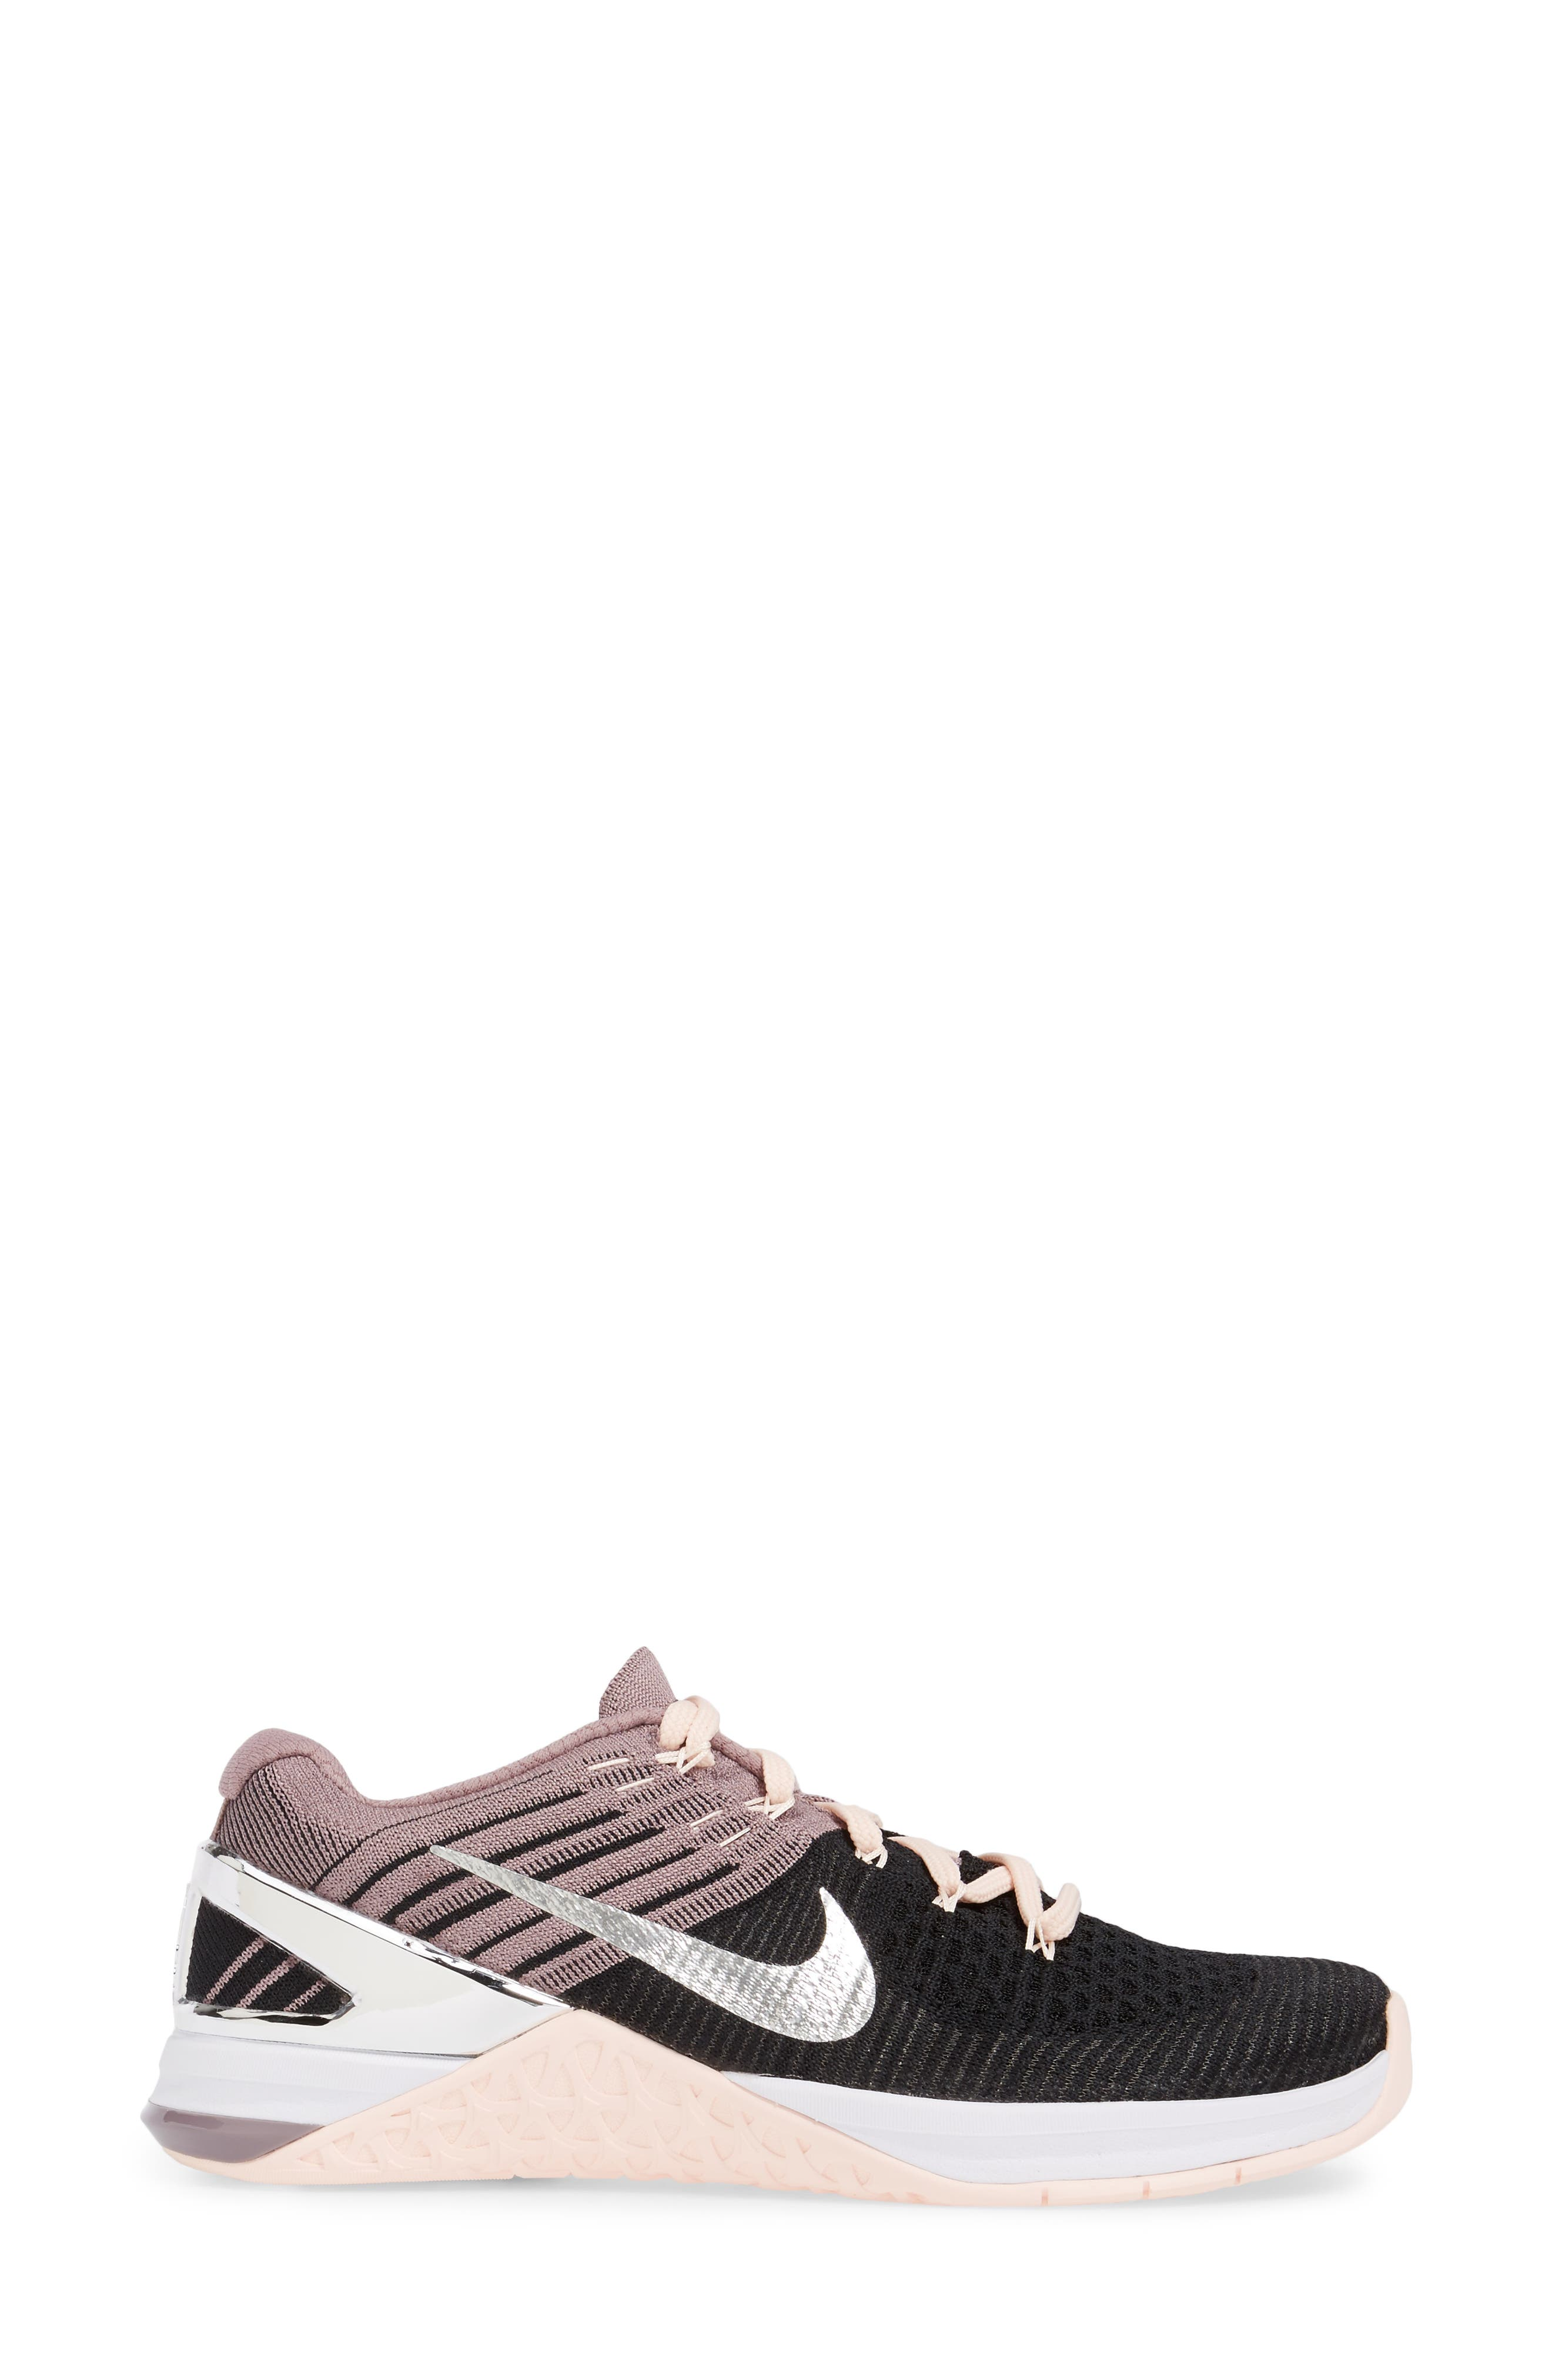 Alternate Image 3  - Nike Metcon DSX Flyknit Chrome Blush Training Shoe (Women)